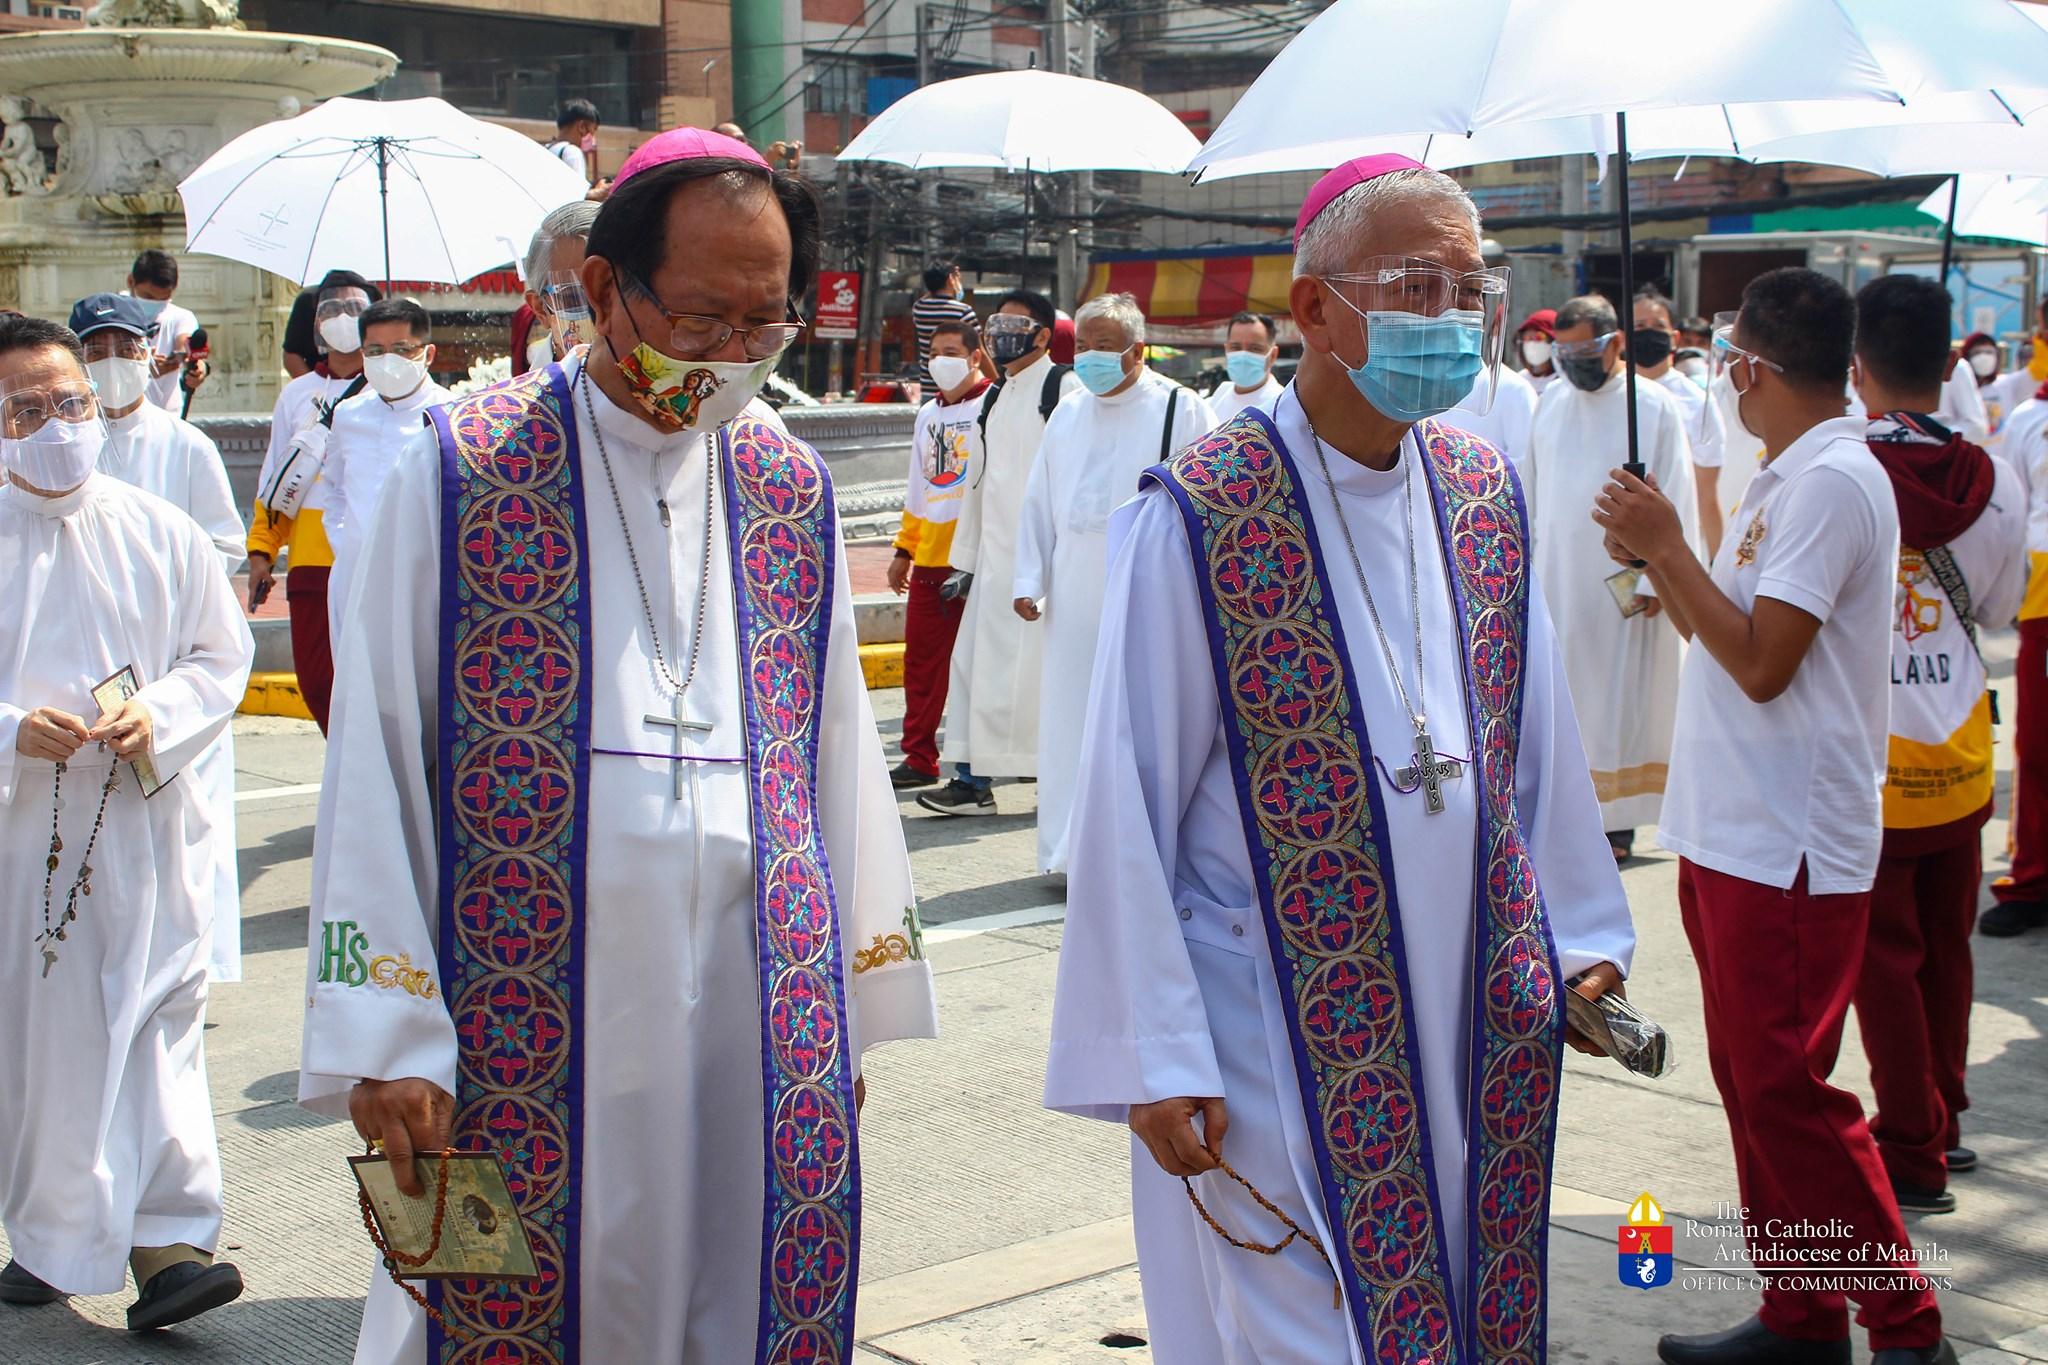 Bishop Pabillo emphasizes 'spiritual impact' of priests' Penitential Walk